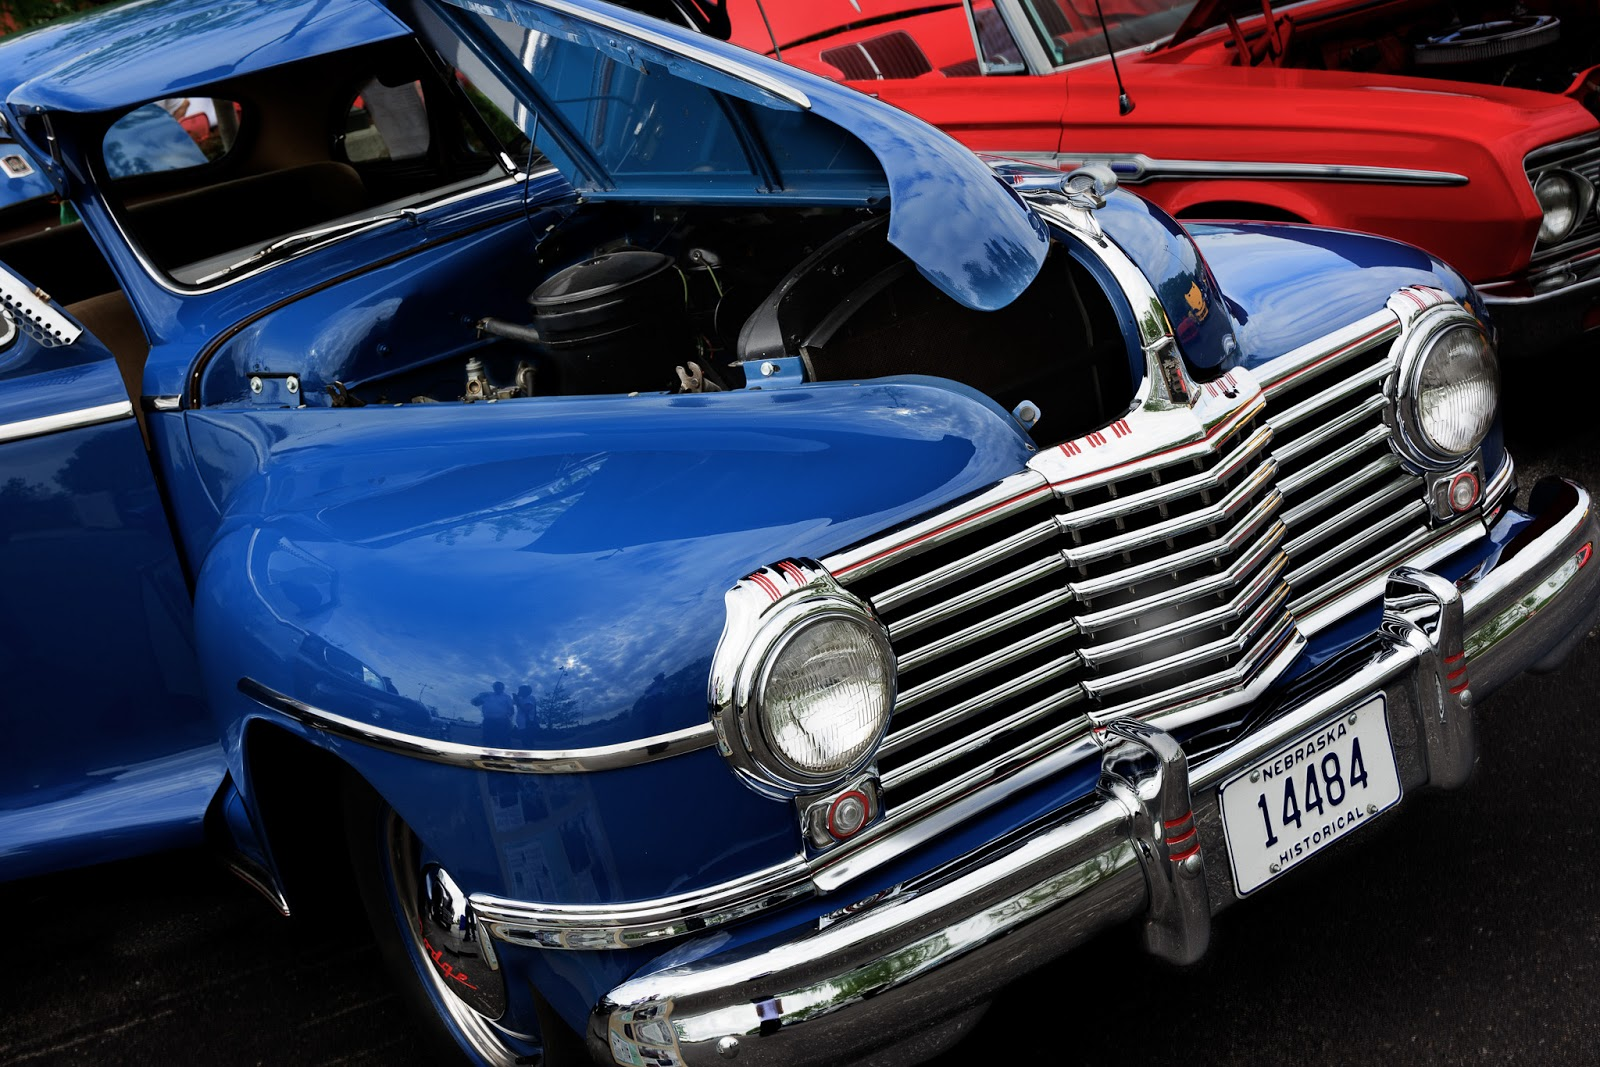 1942 Dodge Deluxe 4 Door Sedan Iowa Farm Boy Chevy Coupe